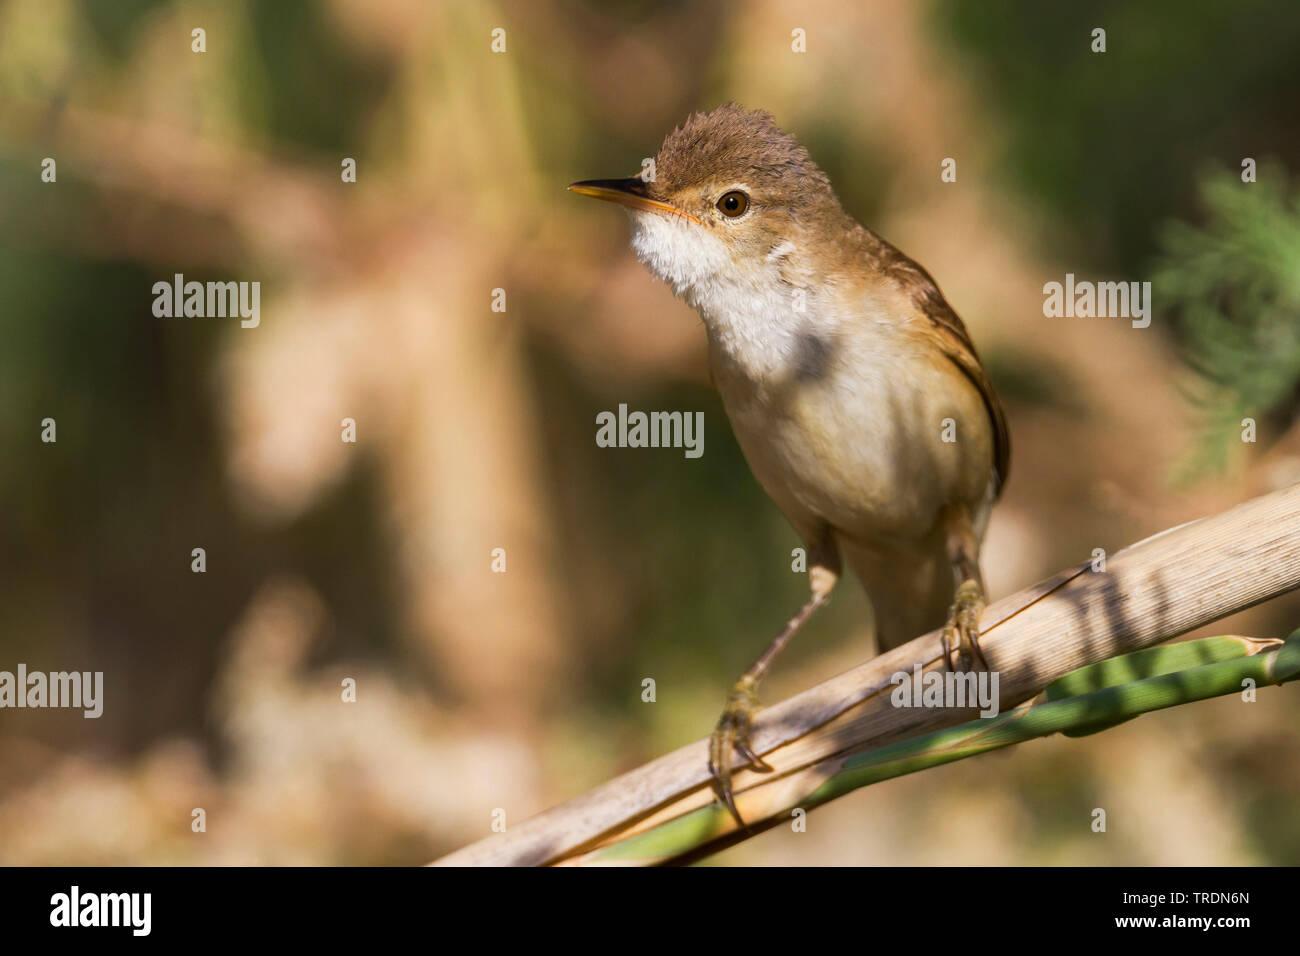 Eurasian Reed Warbler, Caspian Reed Warbler (Acrocephalus scirpaceus ssp. fuscus, Acrocephalus scirpaceus fuscus, Acrocephalus fuscus), perching an reed, Cyprus Stock Photo